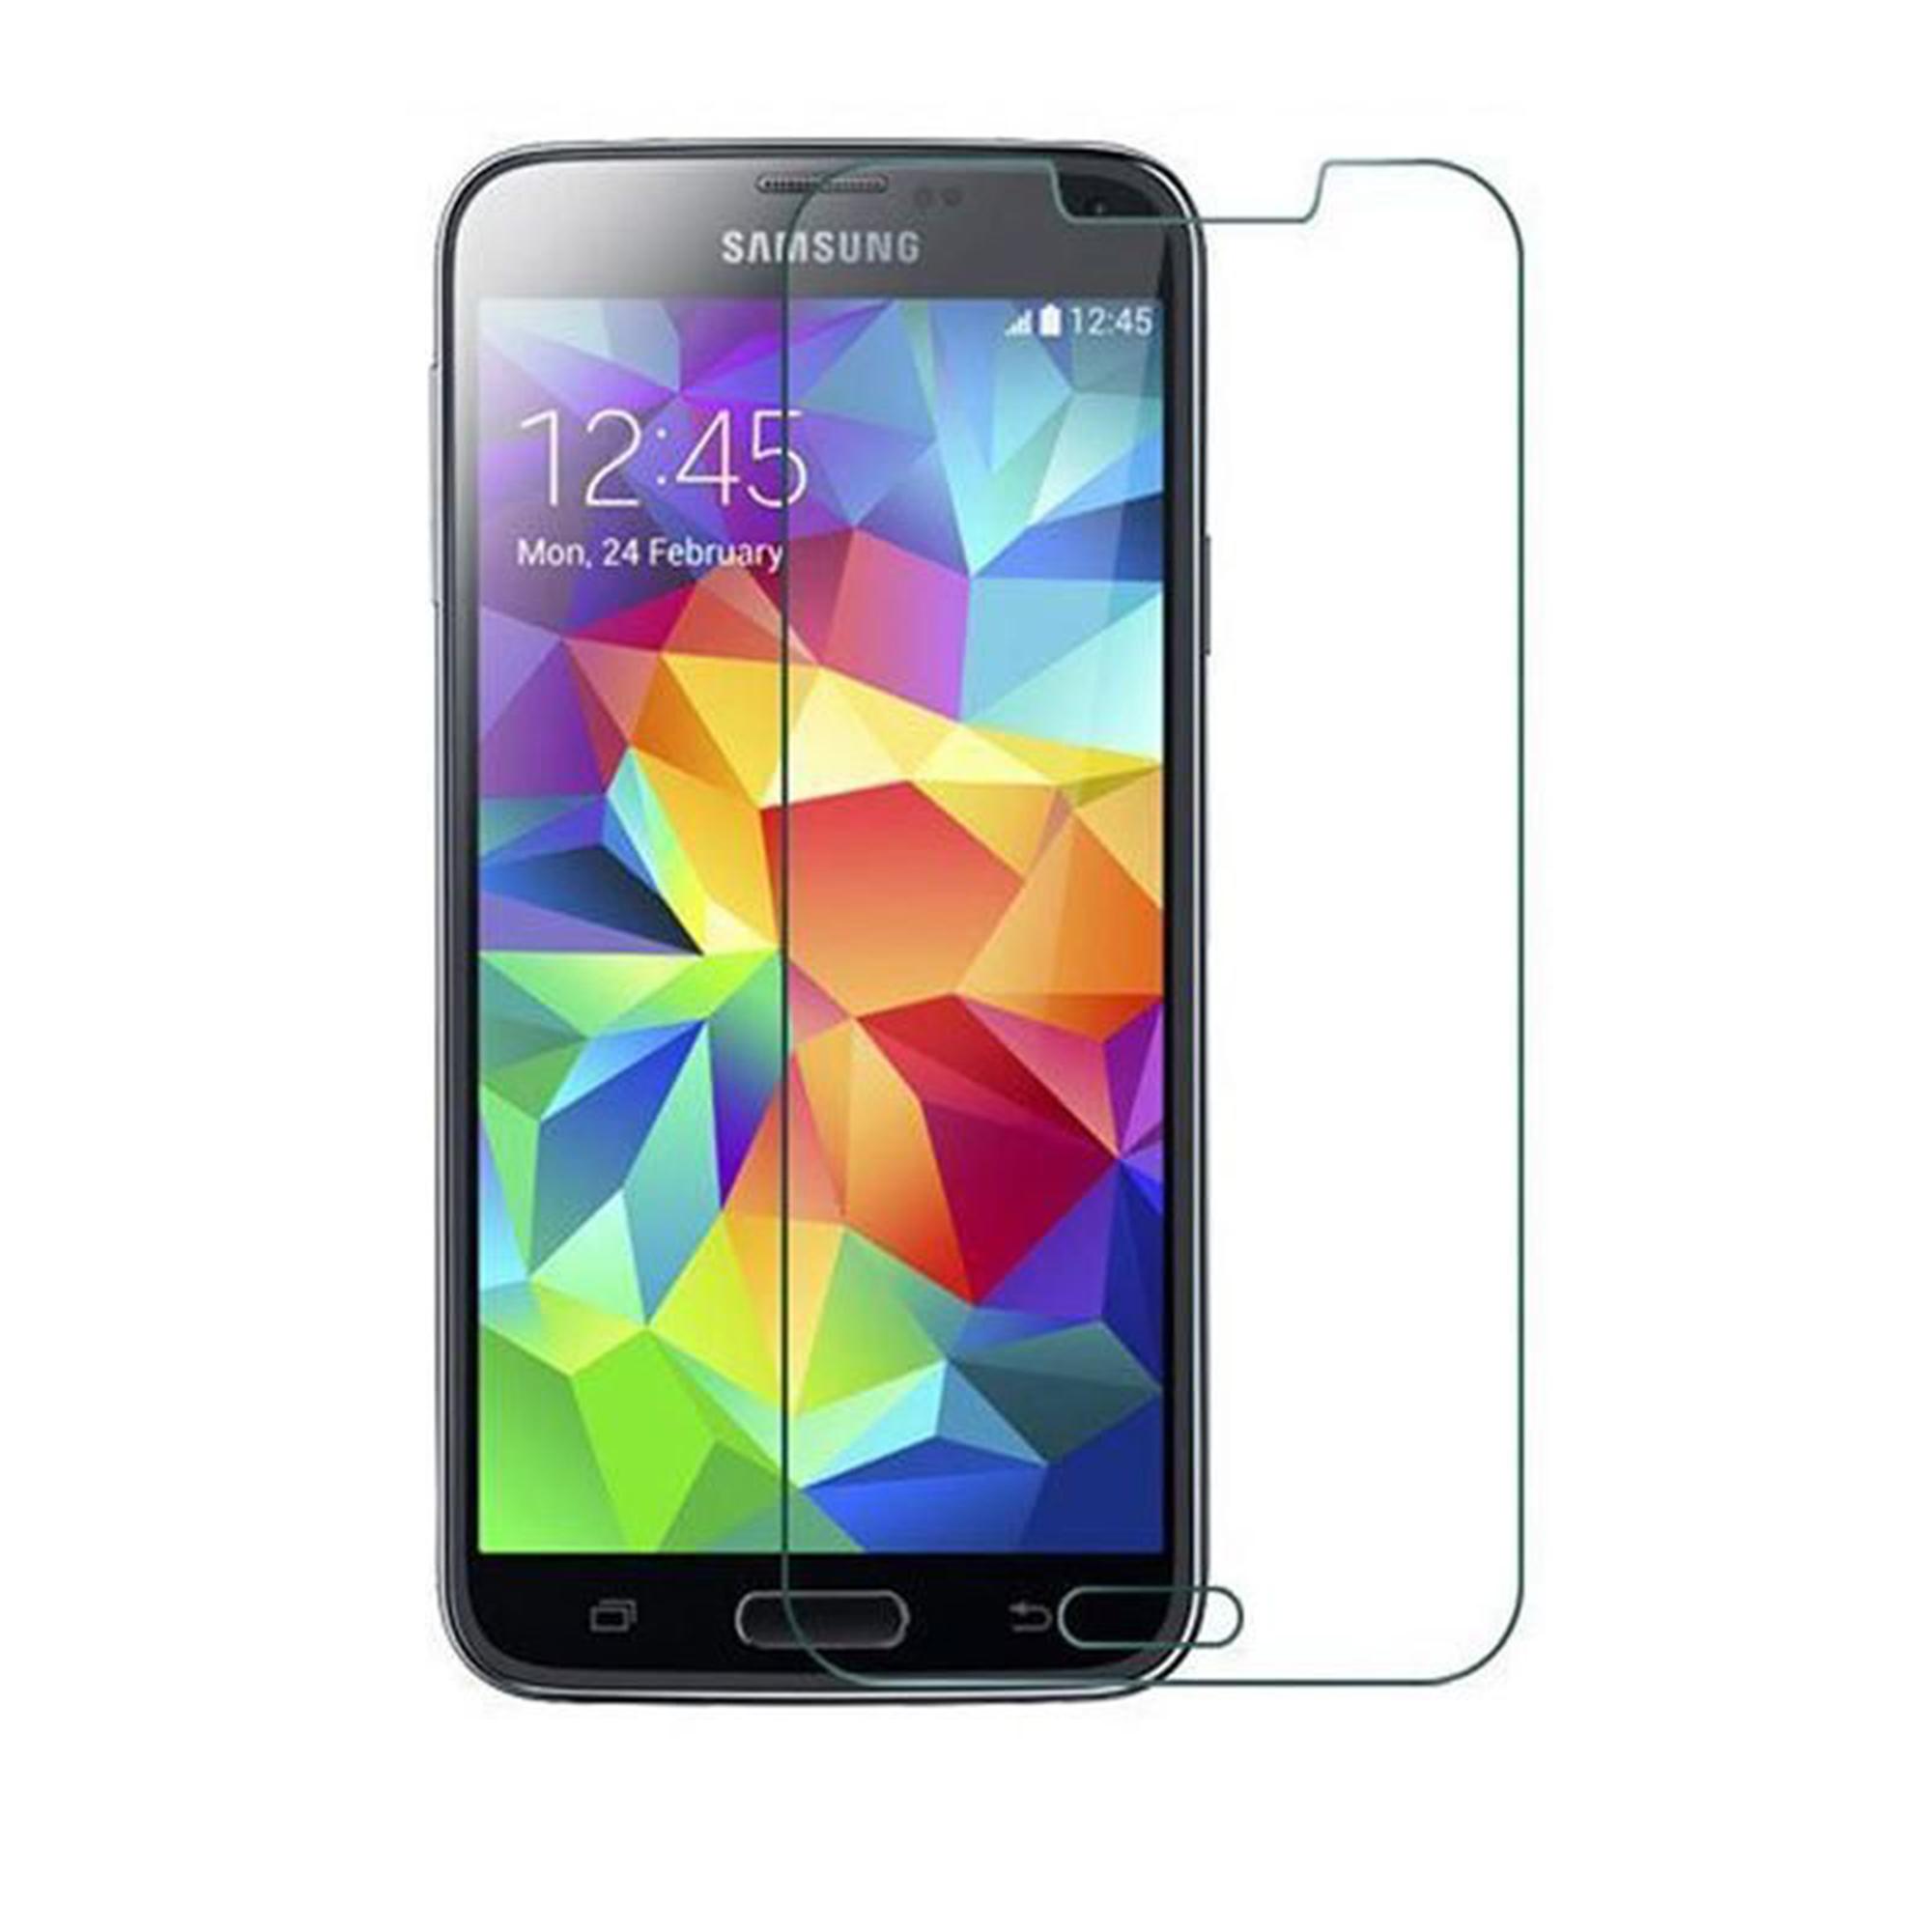 Arc® Samsung Galaxy Grand Prime SM-G530 Tempered Glass Screen Protector